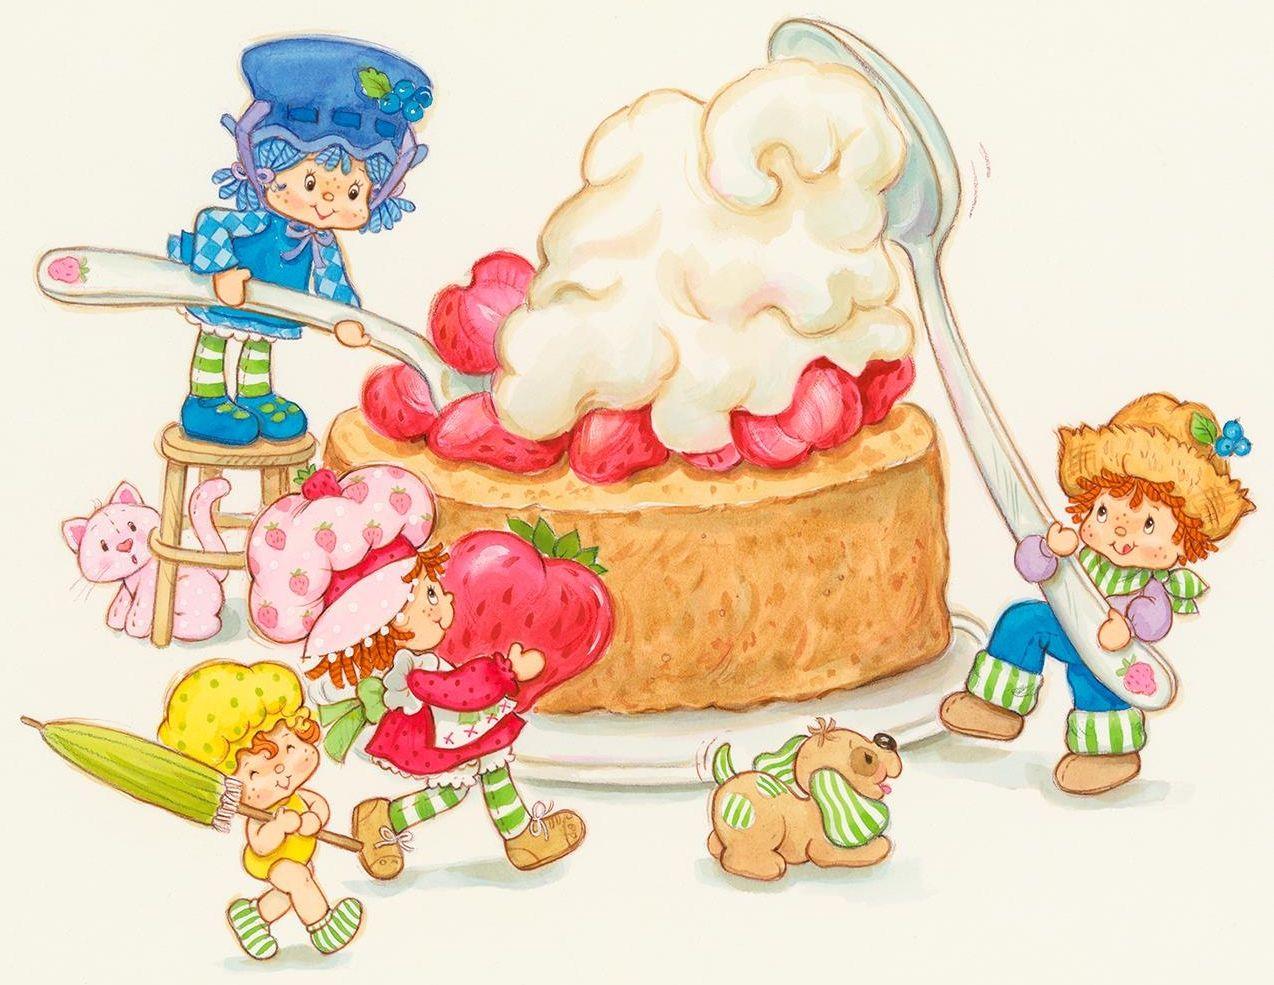 Vintage Strawberry Shortcake - Big Dessert   Rosita fresita ...